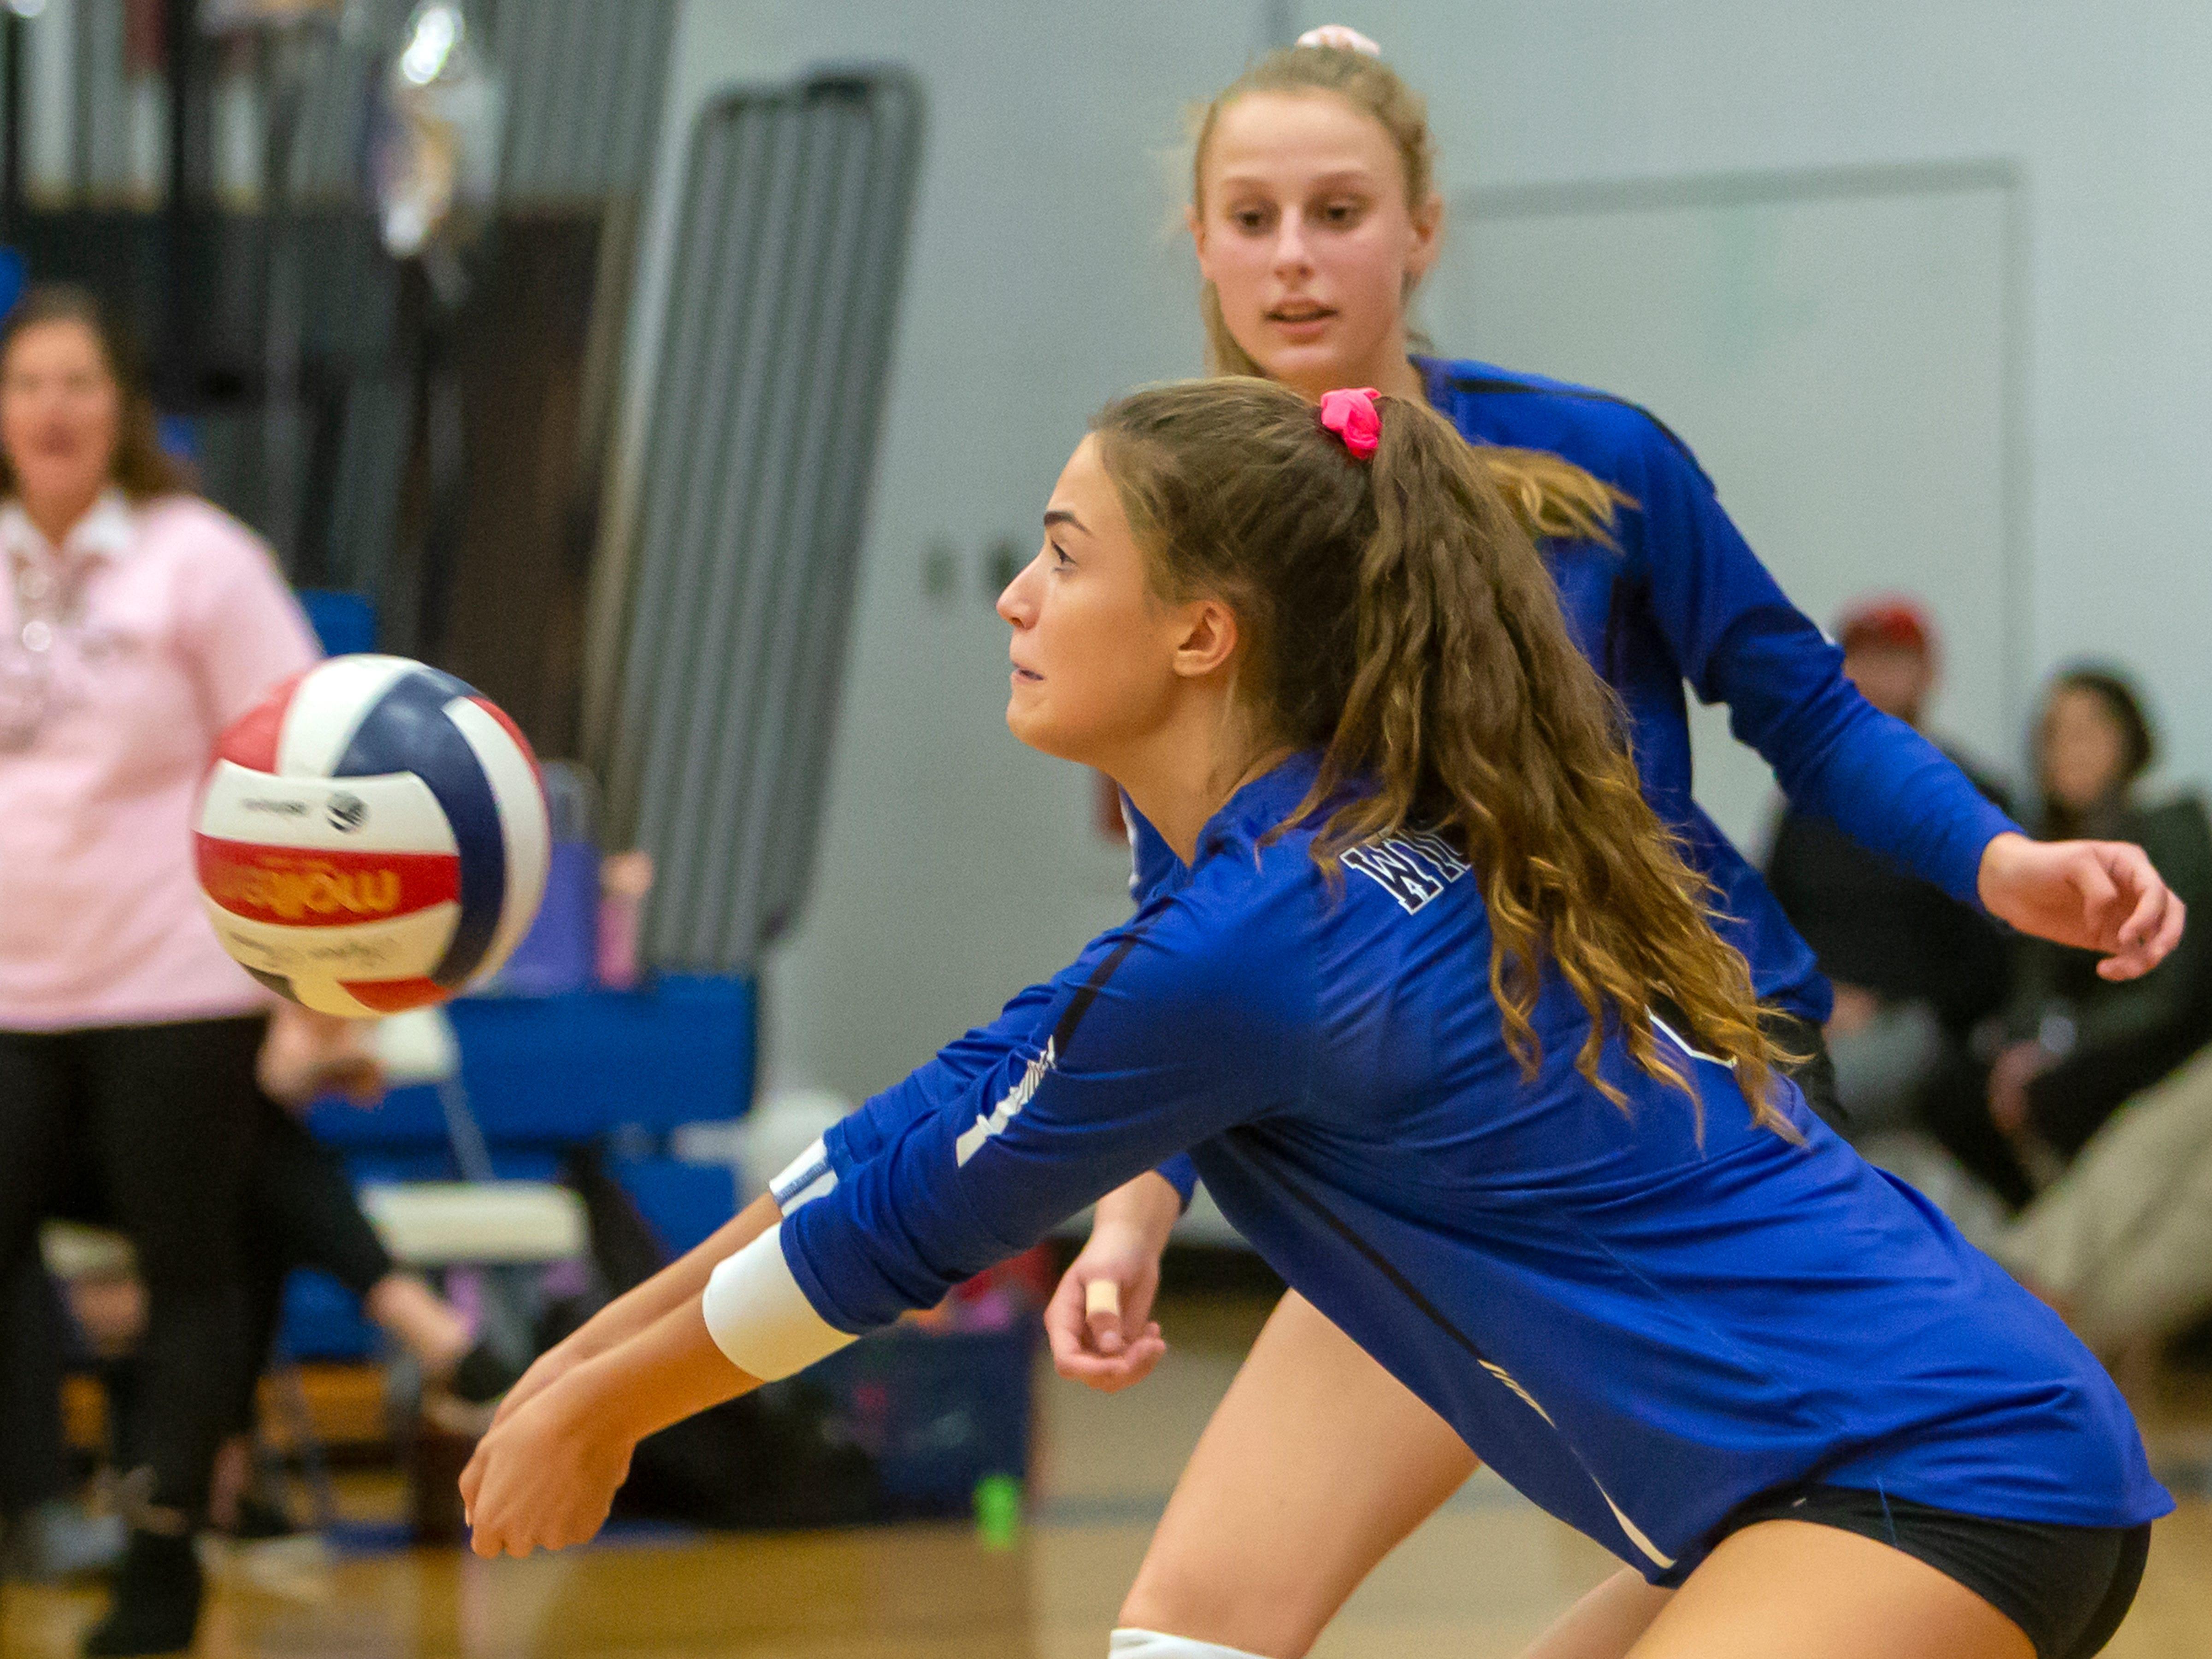 Oshkosh West's Rachel Mueller bumps the ball playing at Oshkosh West High School on Thursday, October 11, 2018.